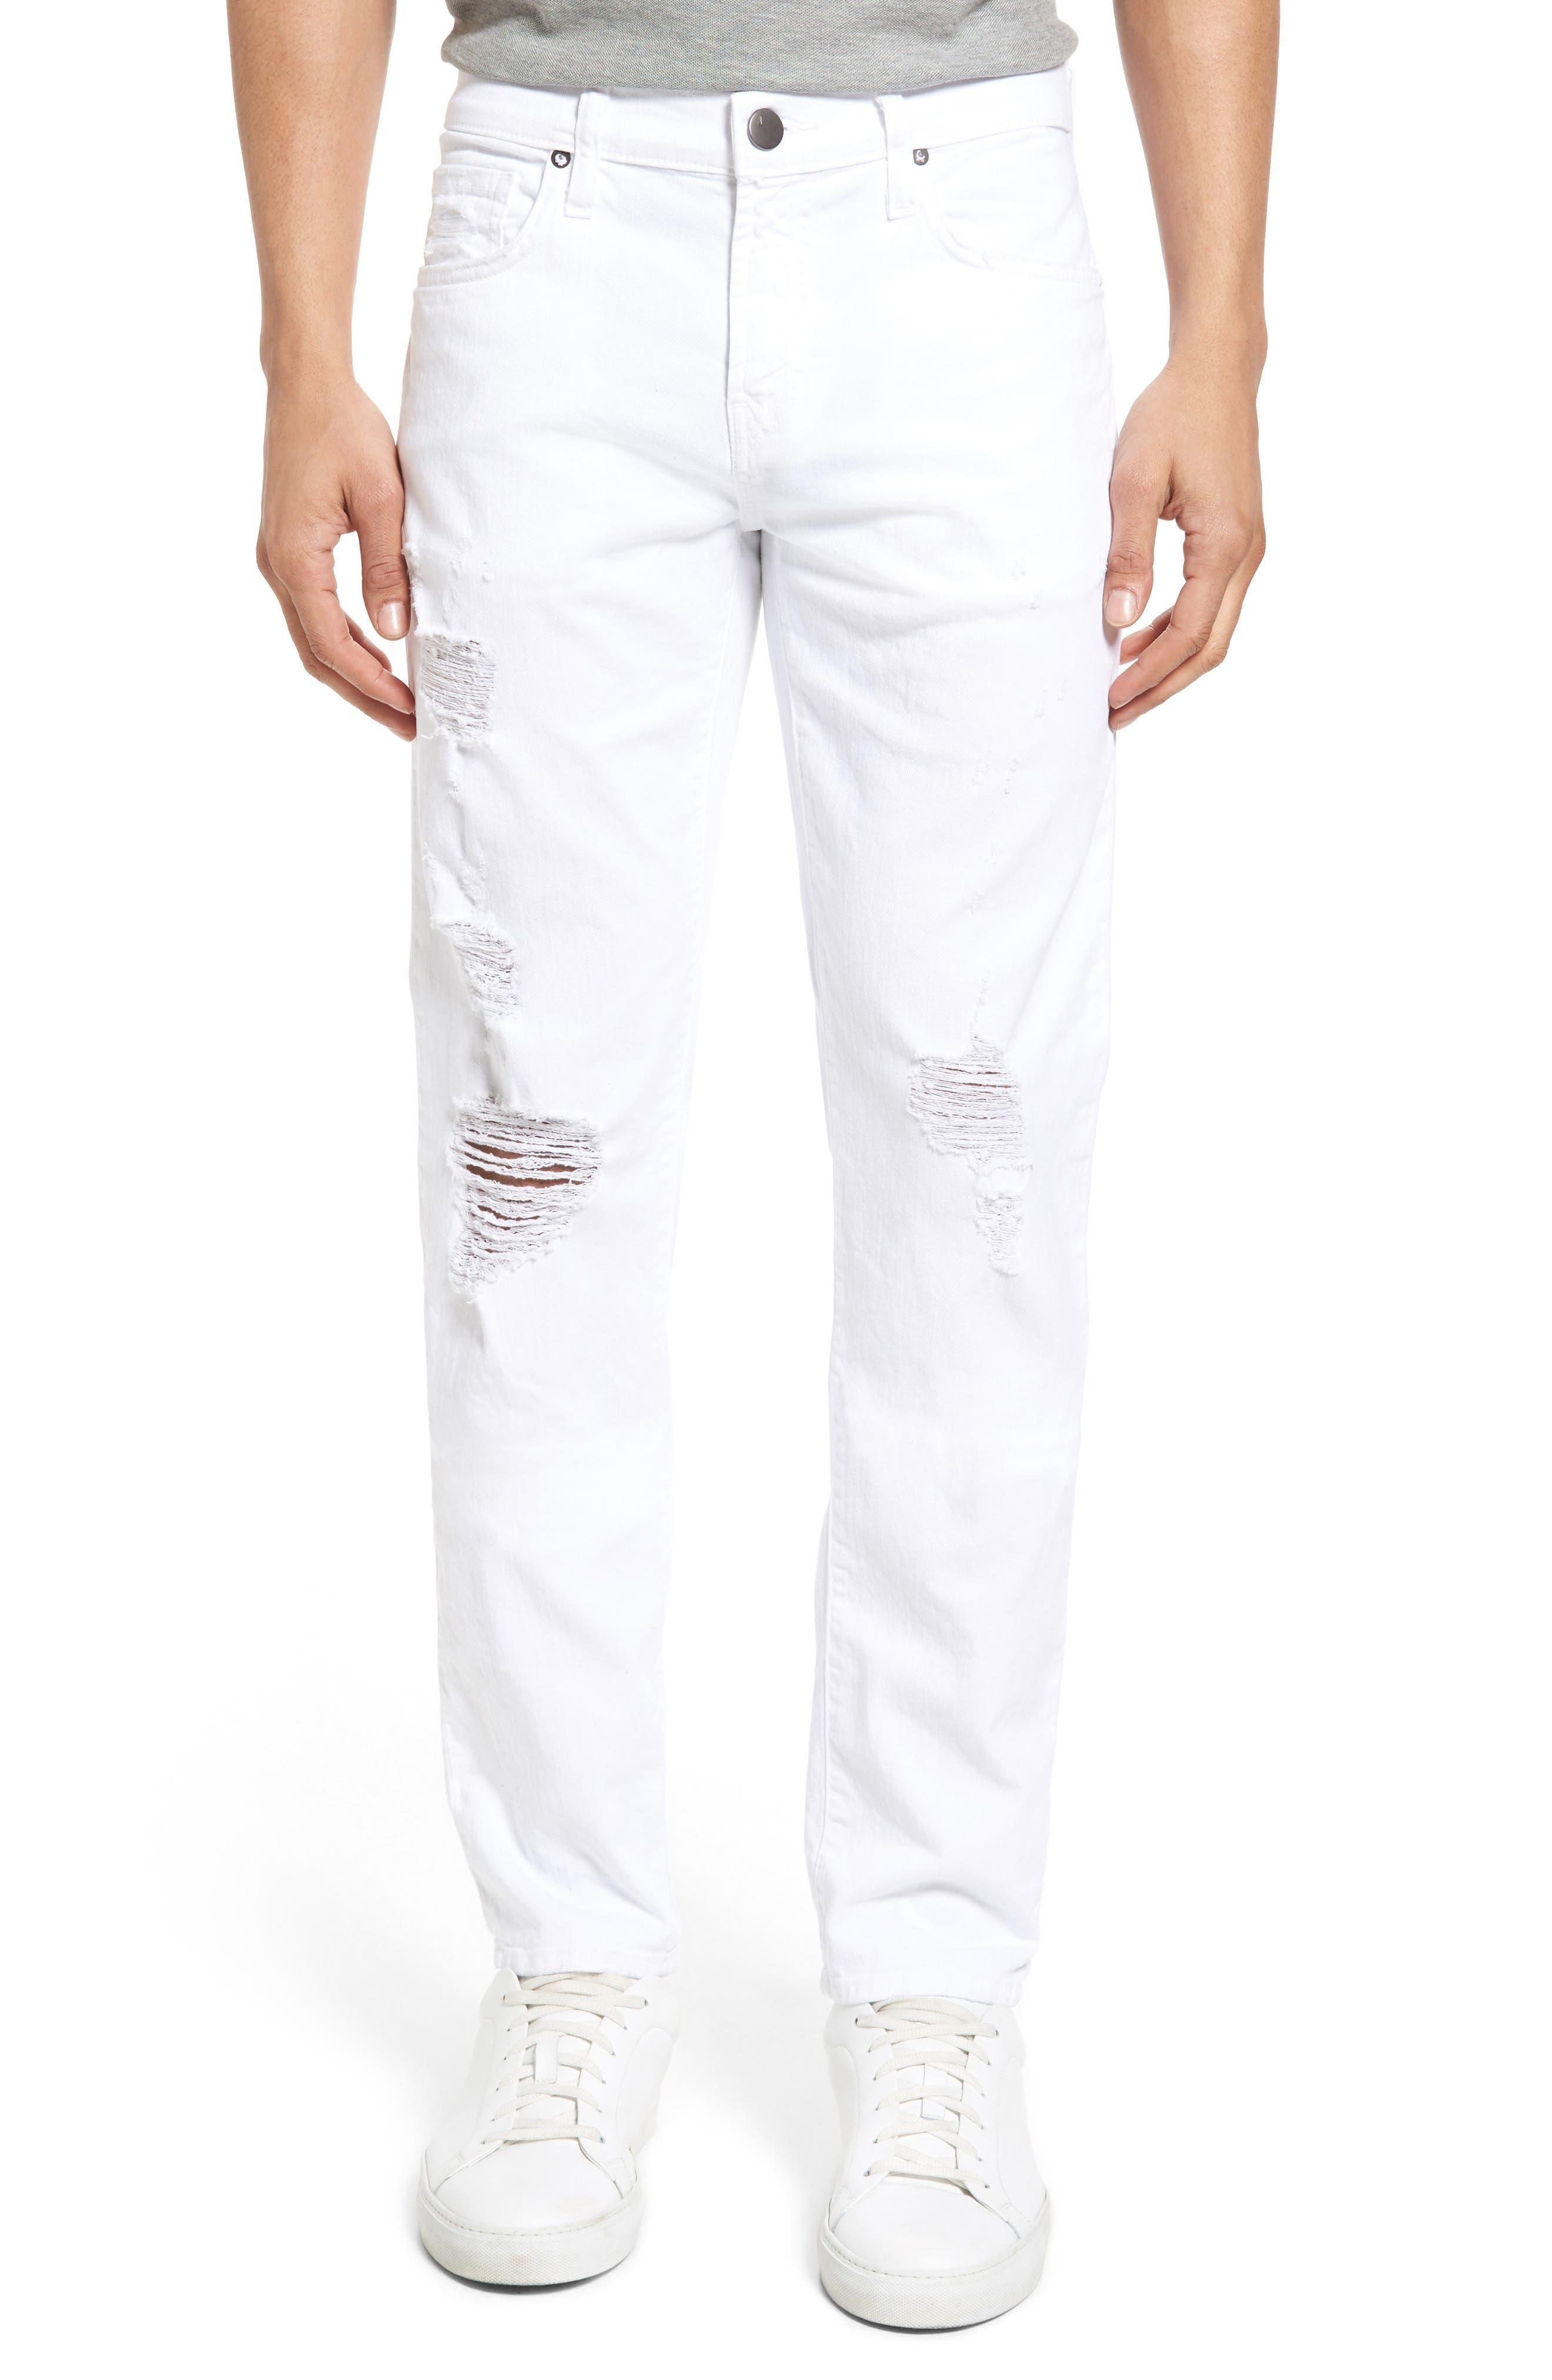 Alternate Image 1 Selected - J Brand Tyler Slim Fit Jeans (Destructed Theoros)